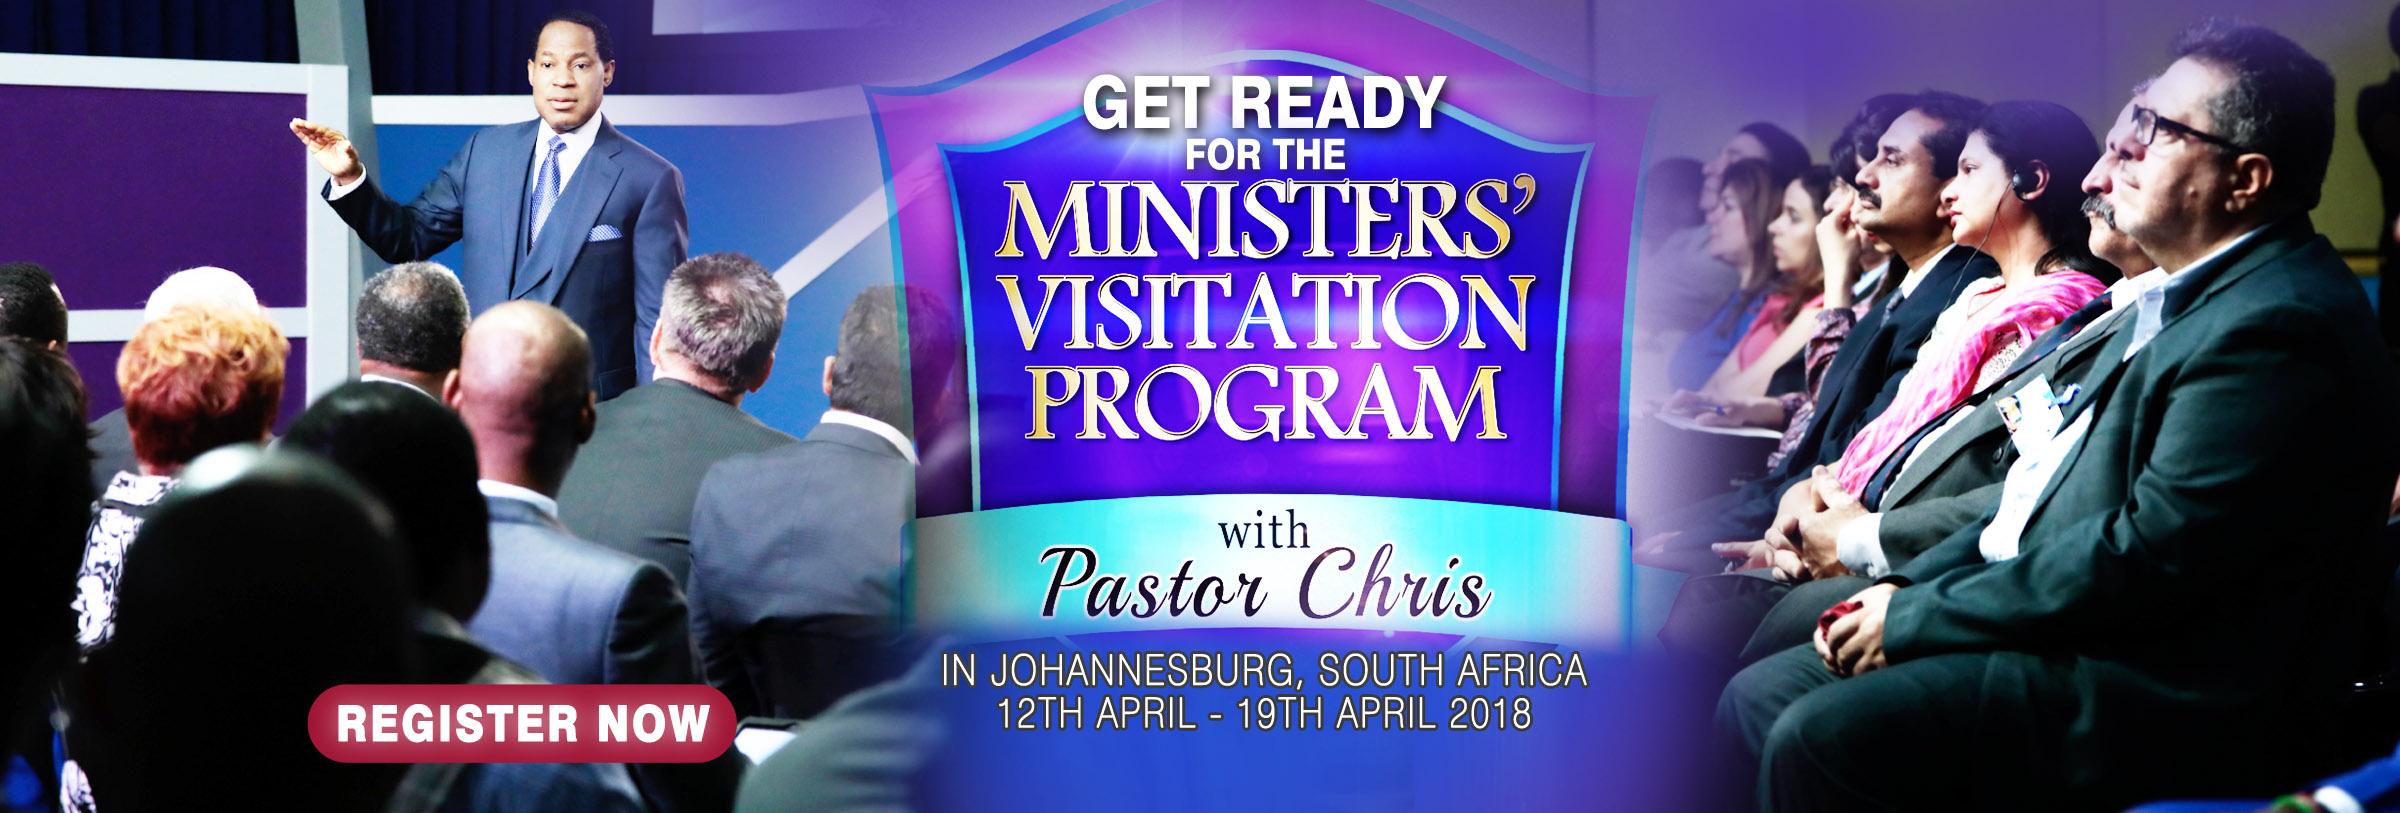 Ministers Visitation Program